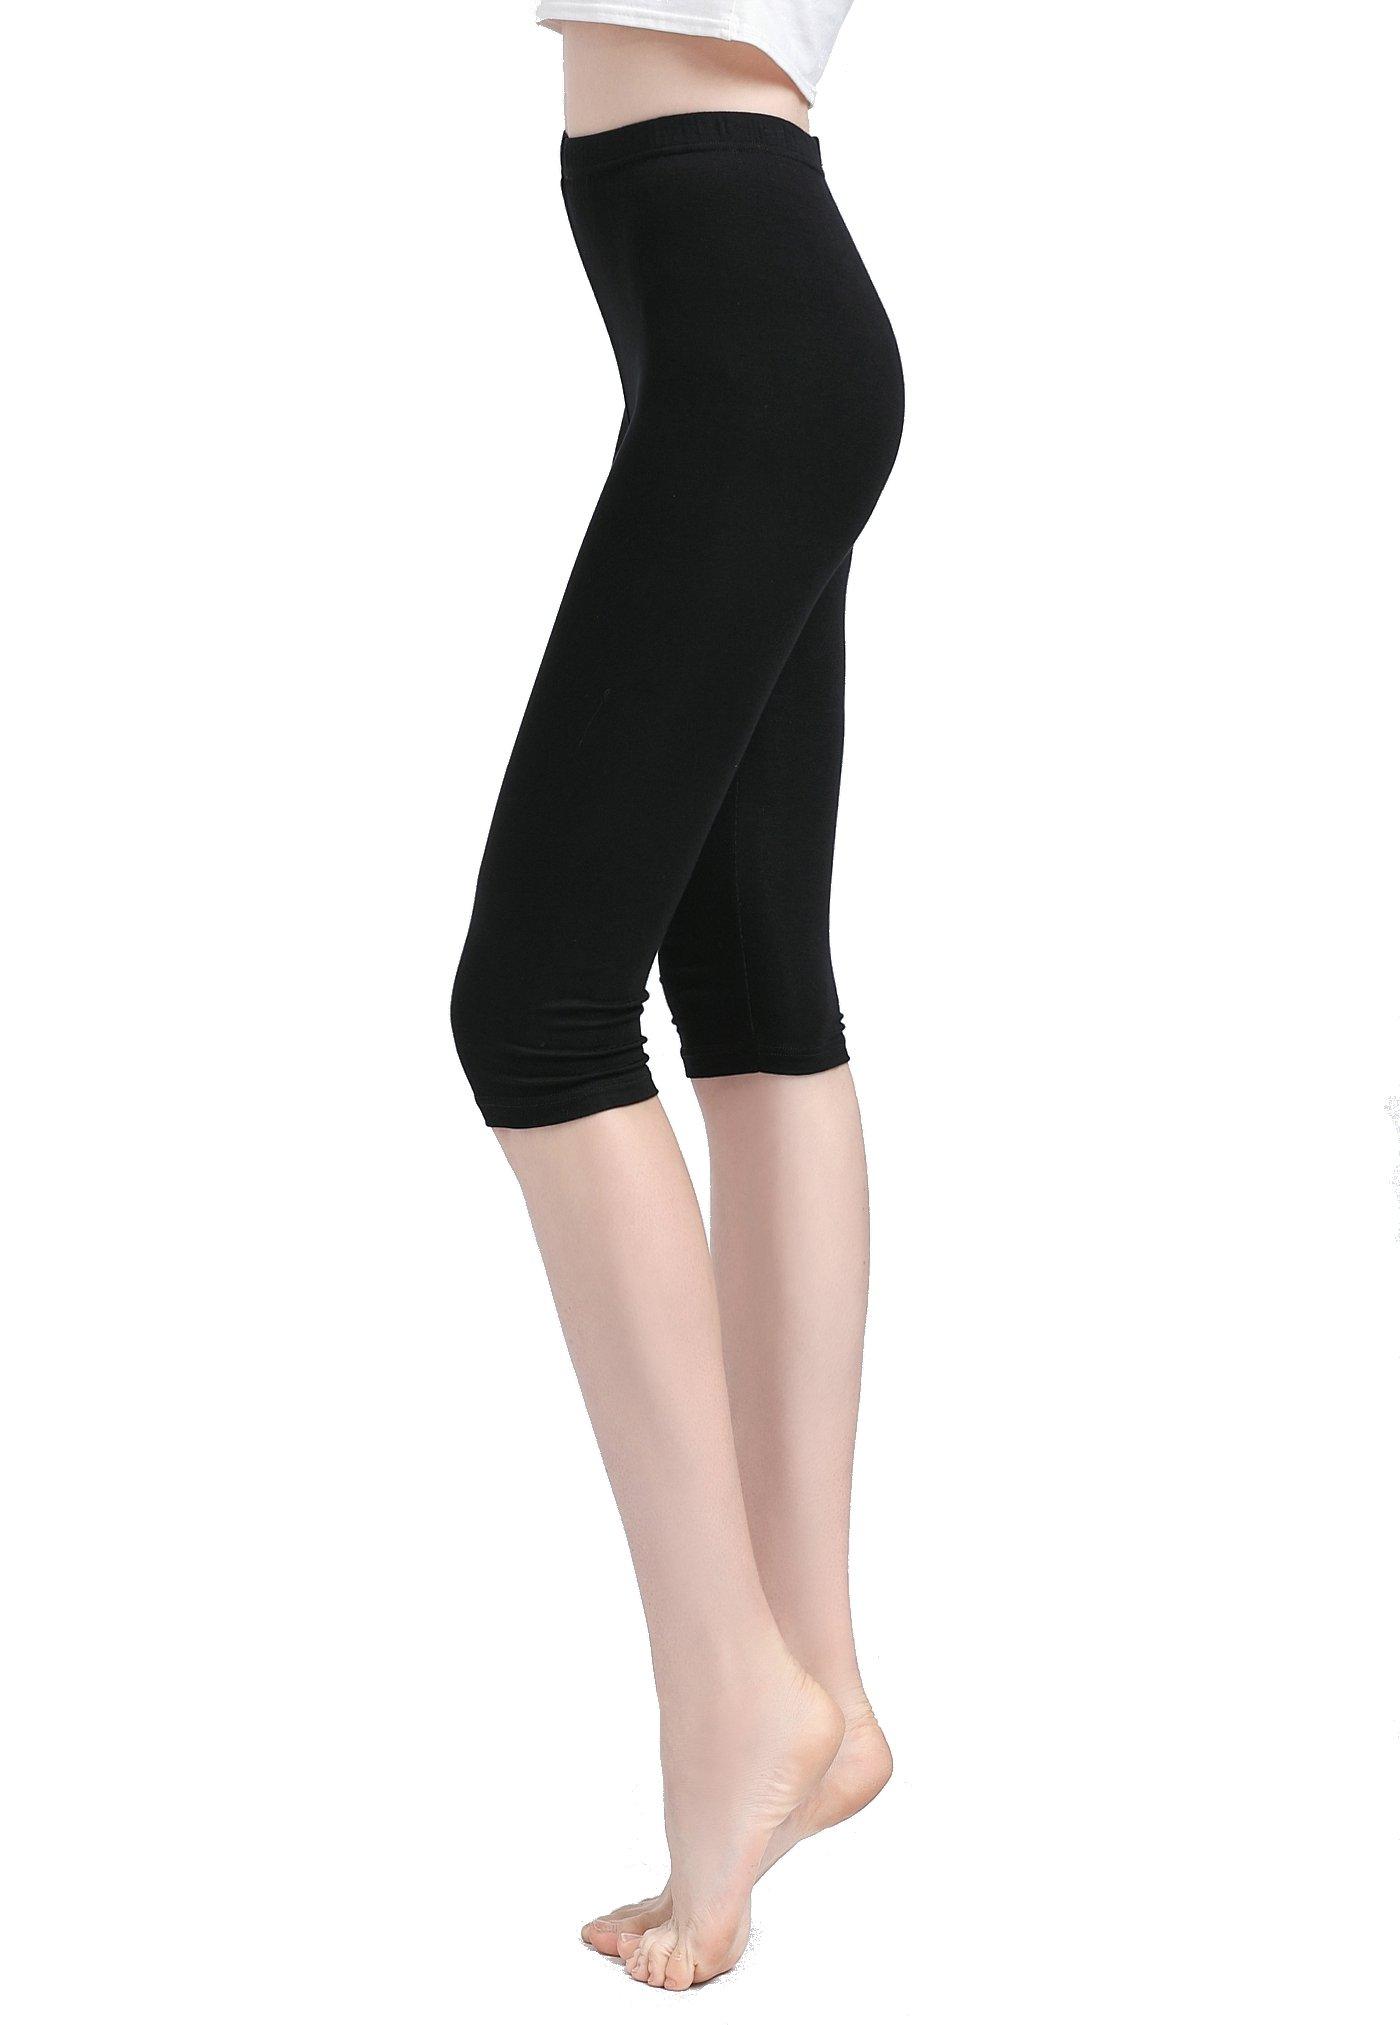 Vinconie Women Activewear Capris Stretchy Exercises Sexy Workout Leggings Soft by Vinconie (Image #2)